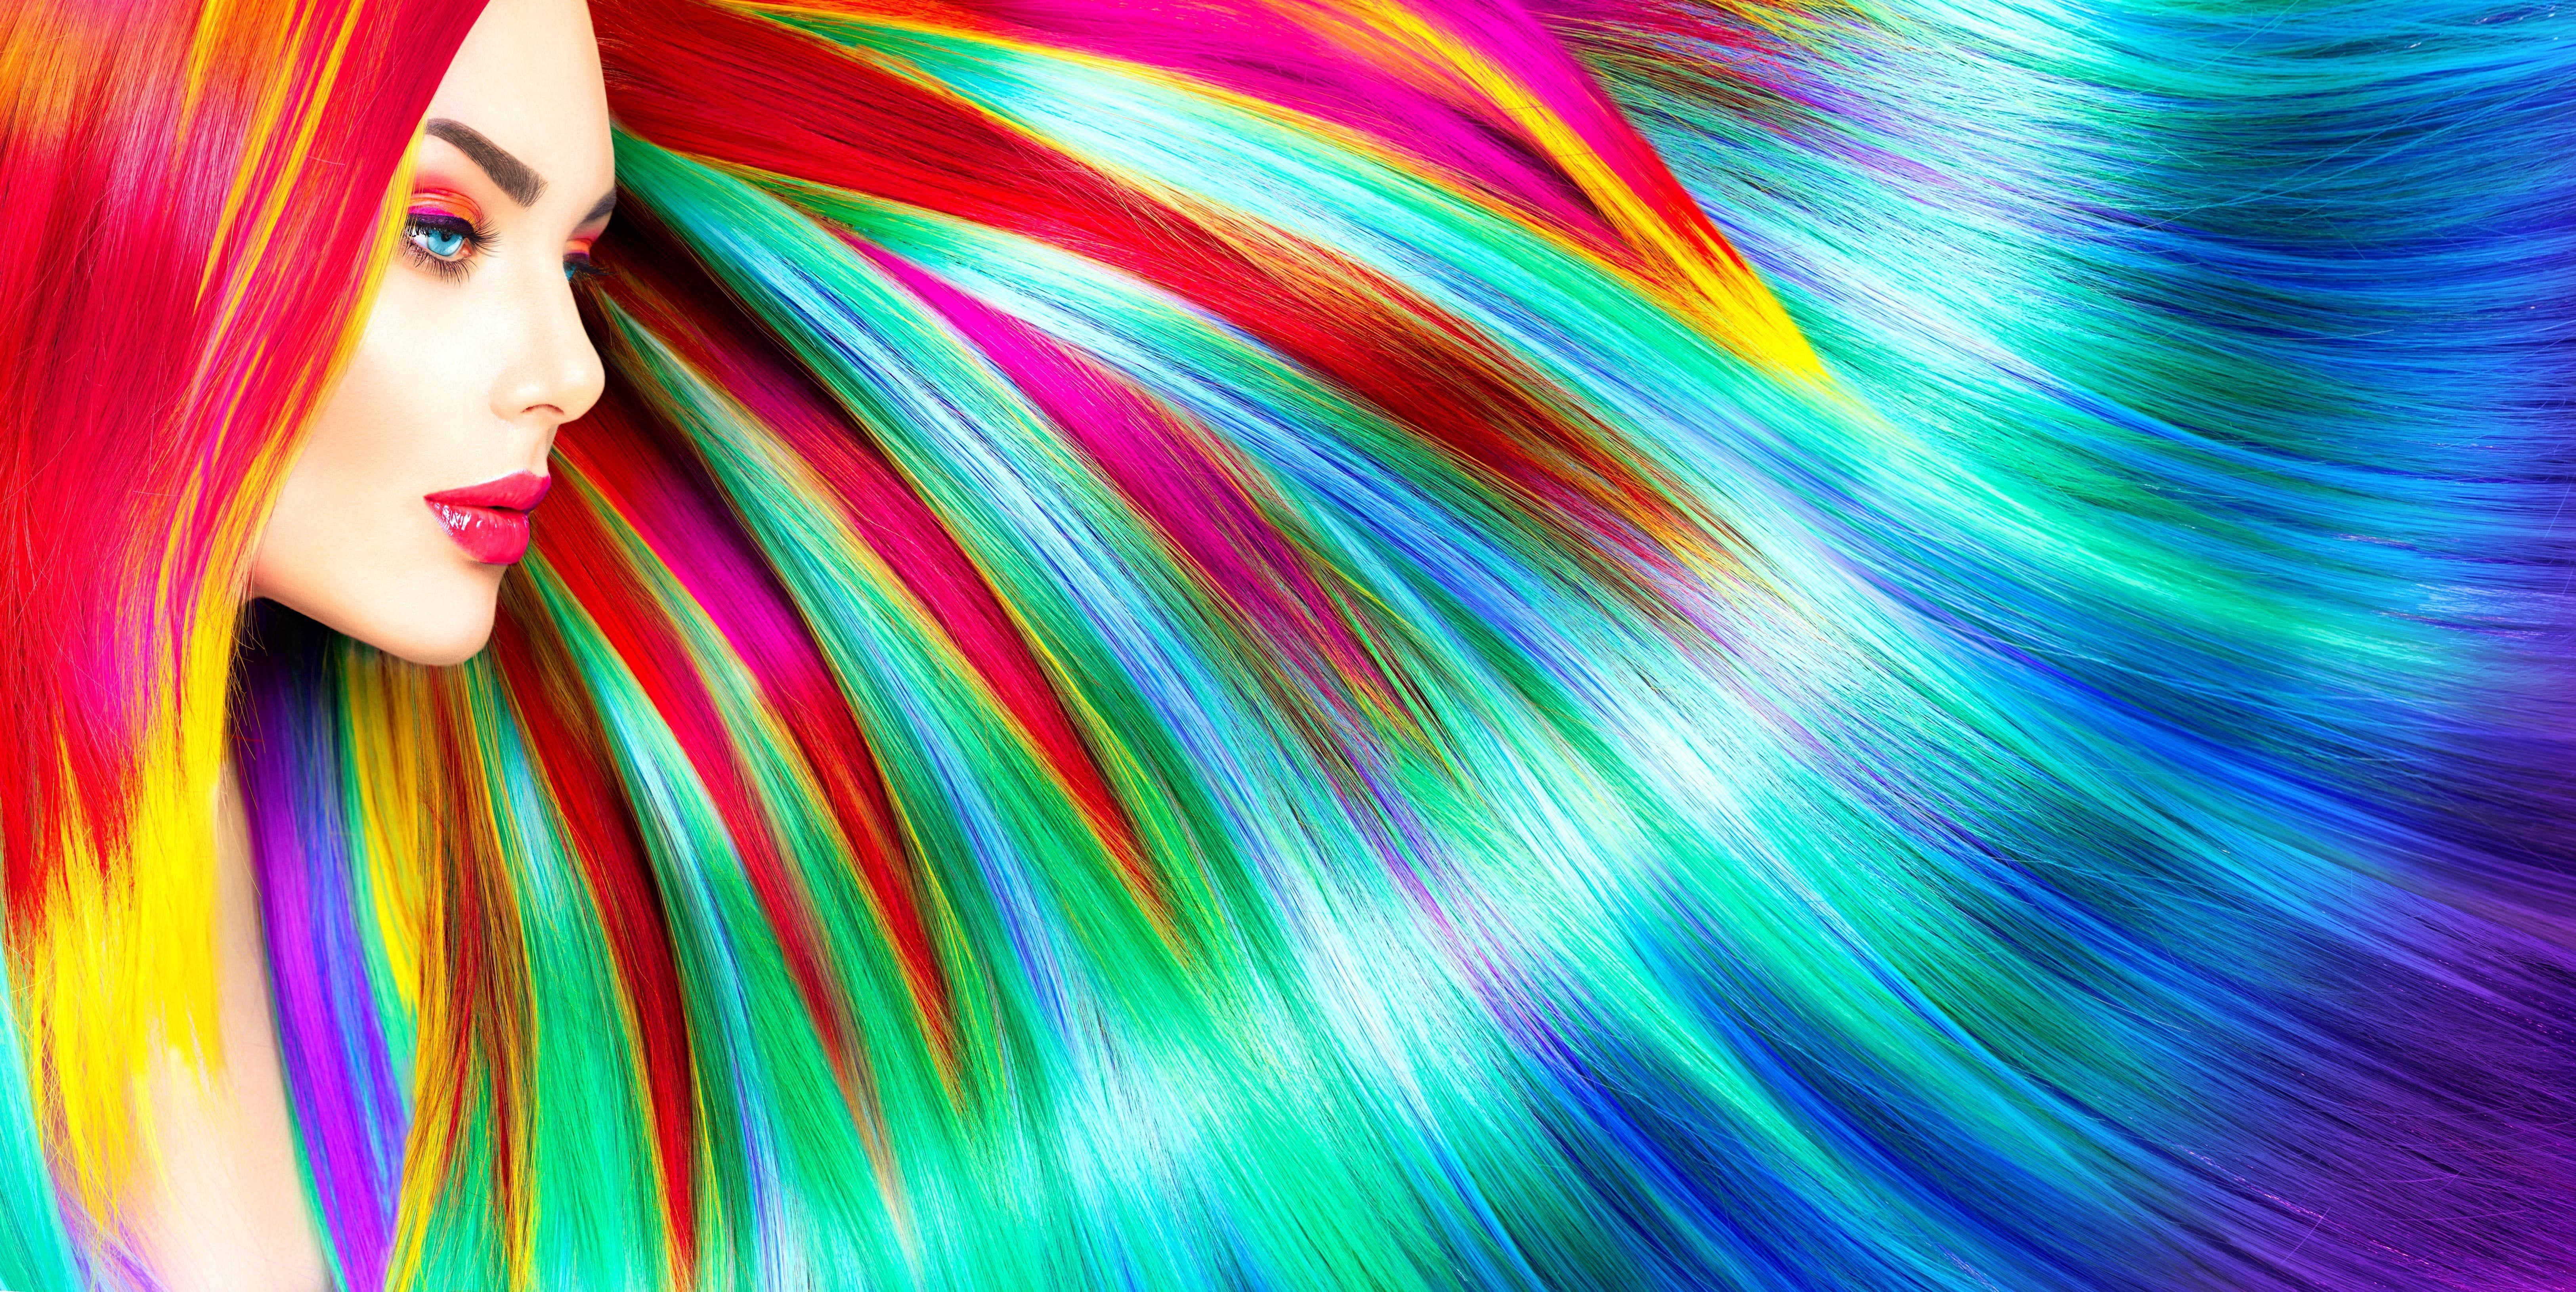 Rainbow Hair Wallpapers Wallpaper Cave